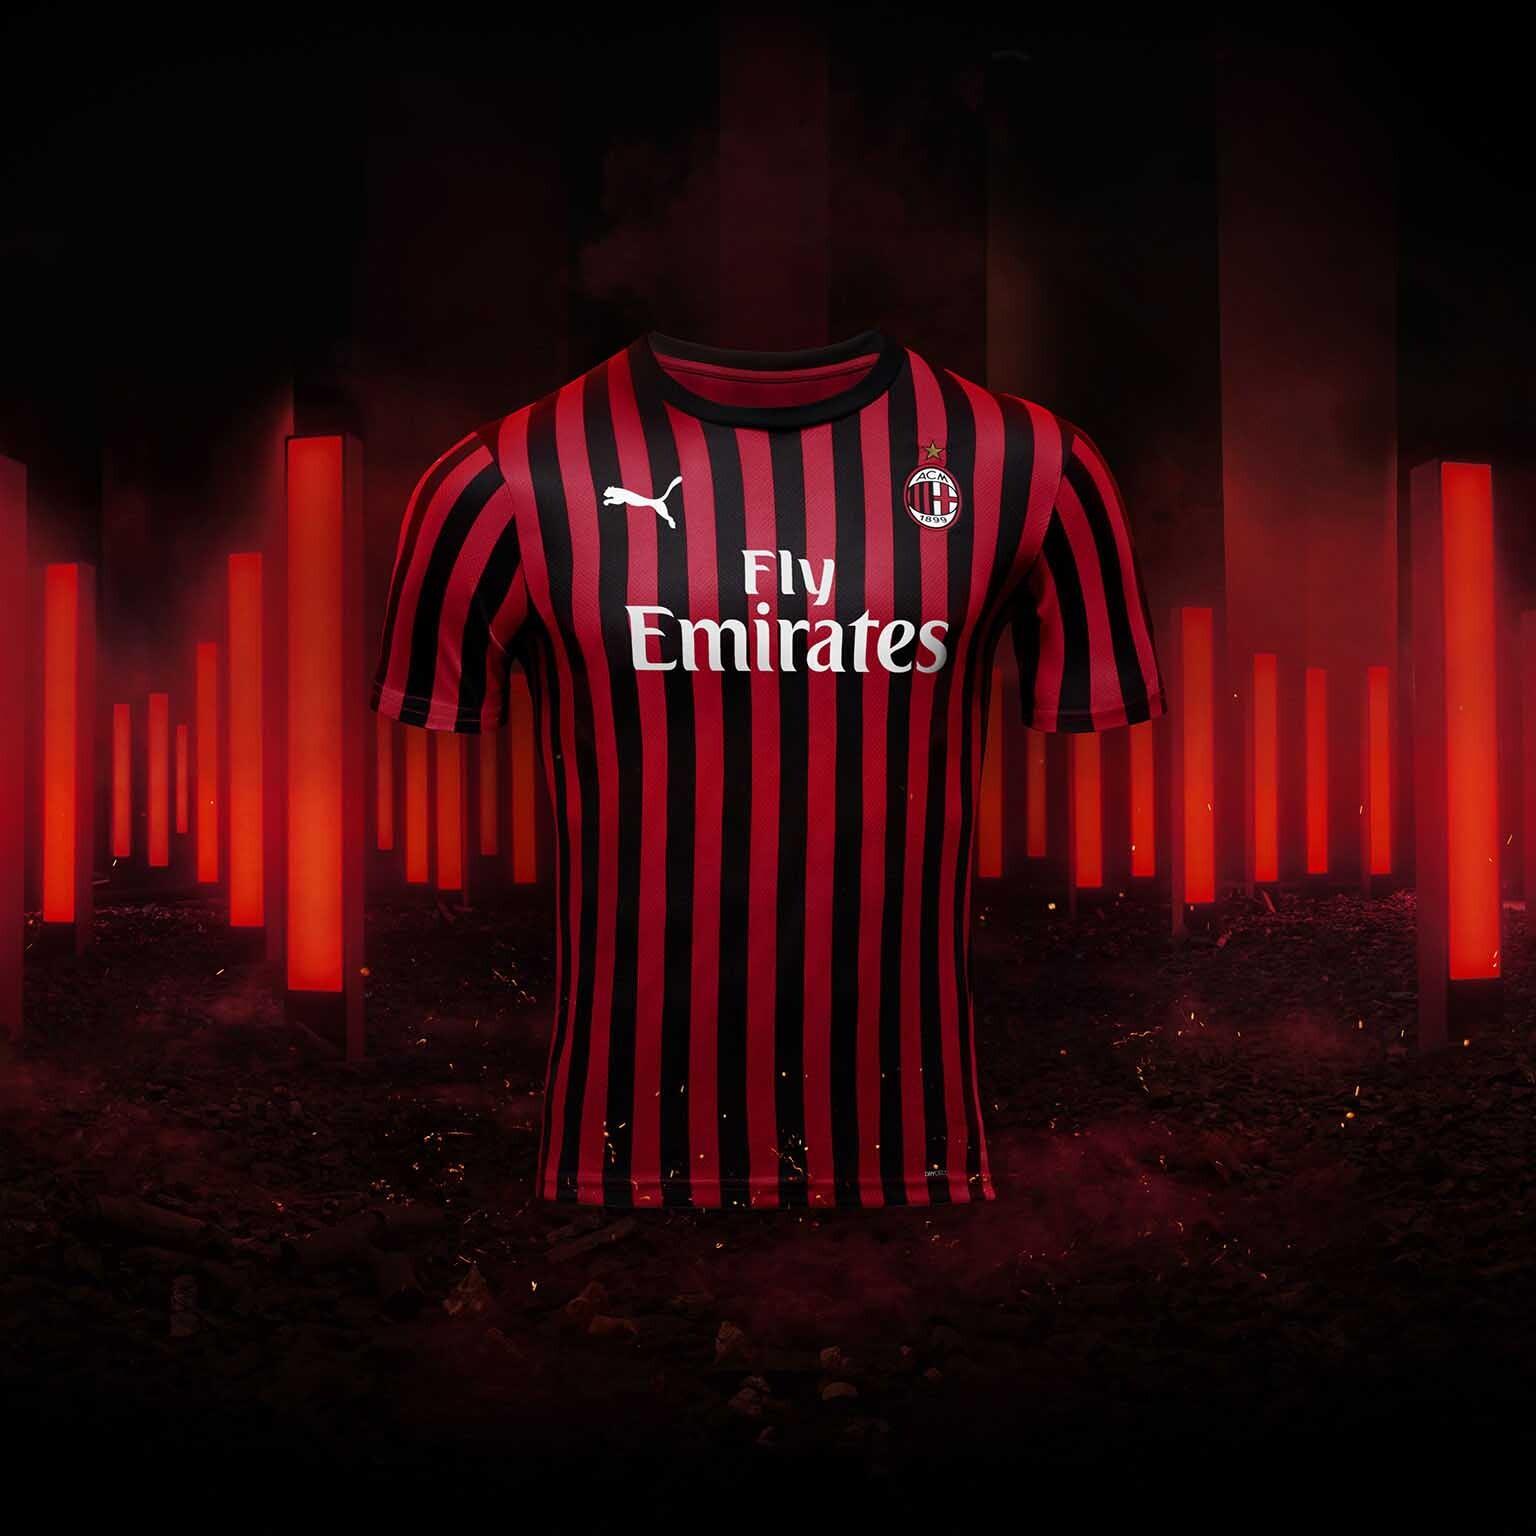 buy online f968d c153b AC Milan: A New Milan | AC Milan Kits, Jerseys, Shirts ...